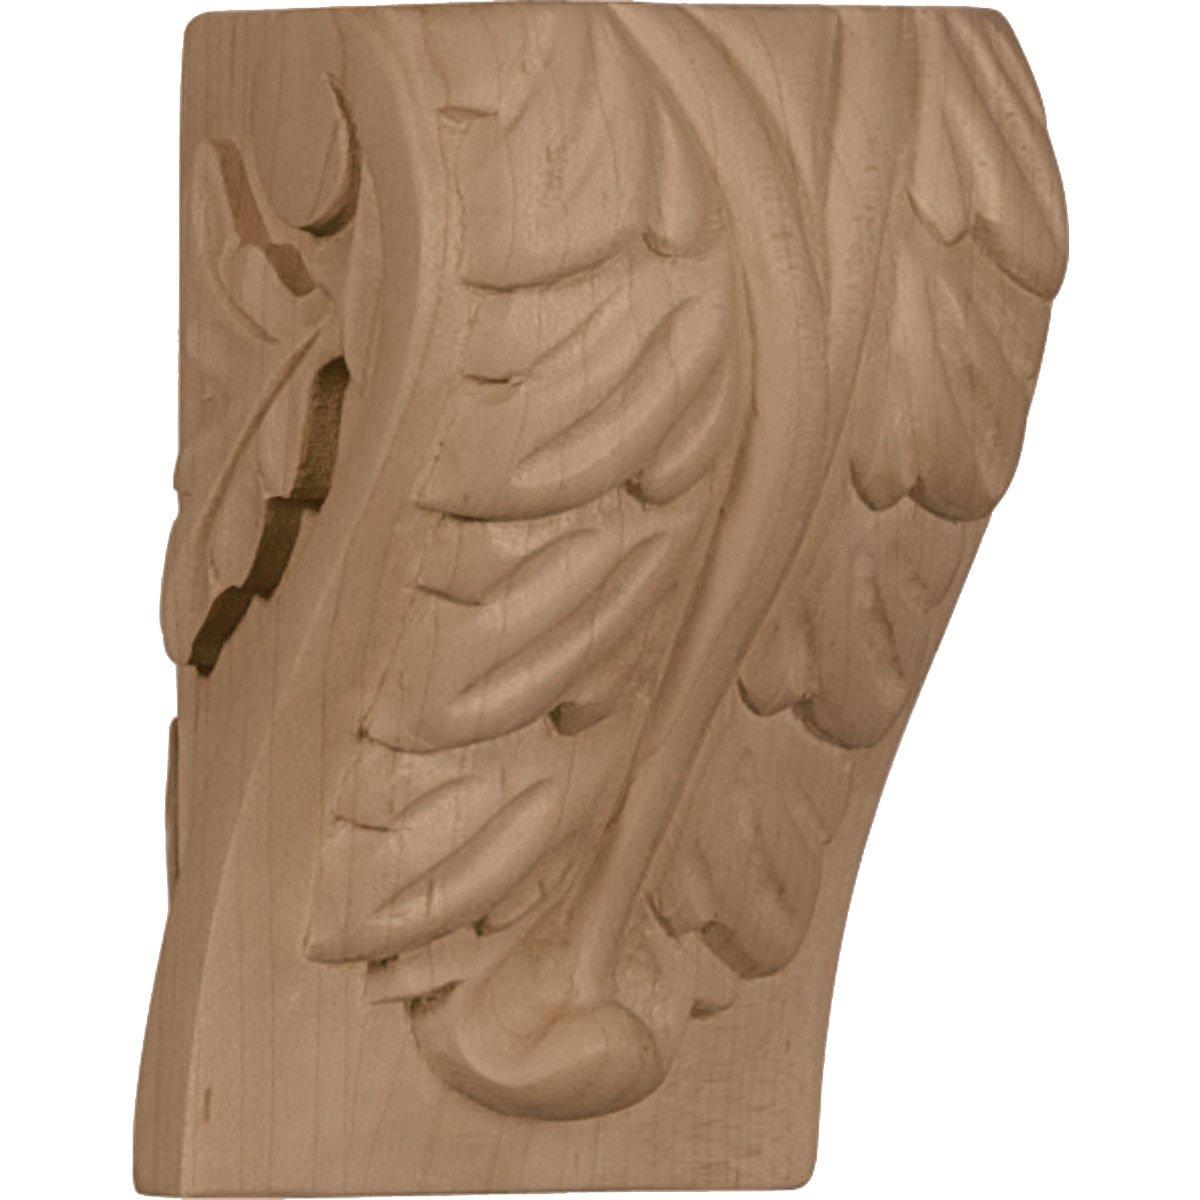 Ekena Millwork CORW01X01X03BAAL-CASE-4 1 3//4 inch W x 1 2 inch D x 3 inch H Mini Acanthus Leaf Block Corbel 4-Pack , Alder